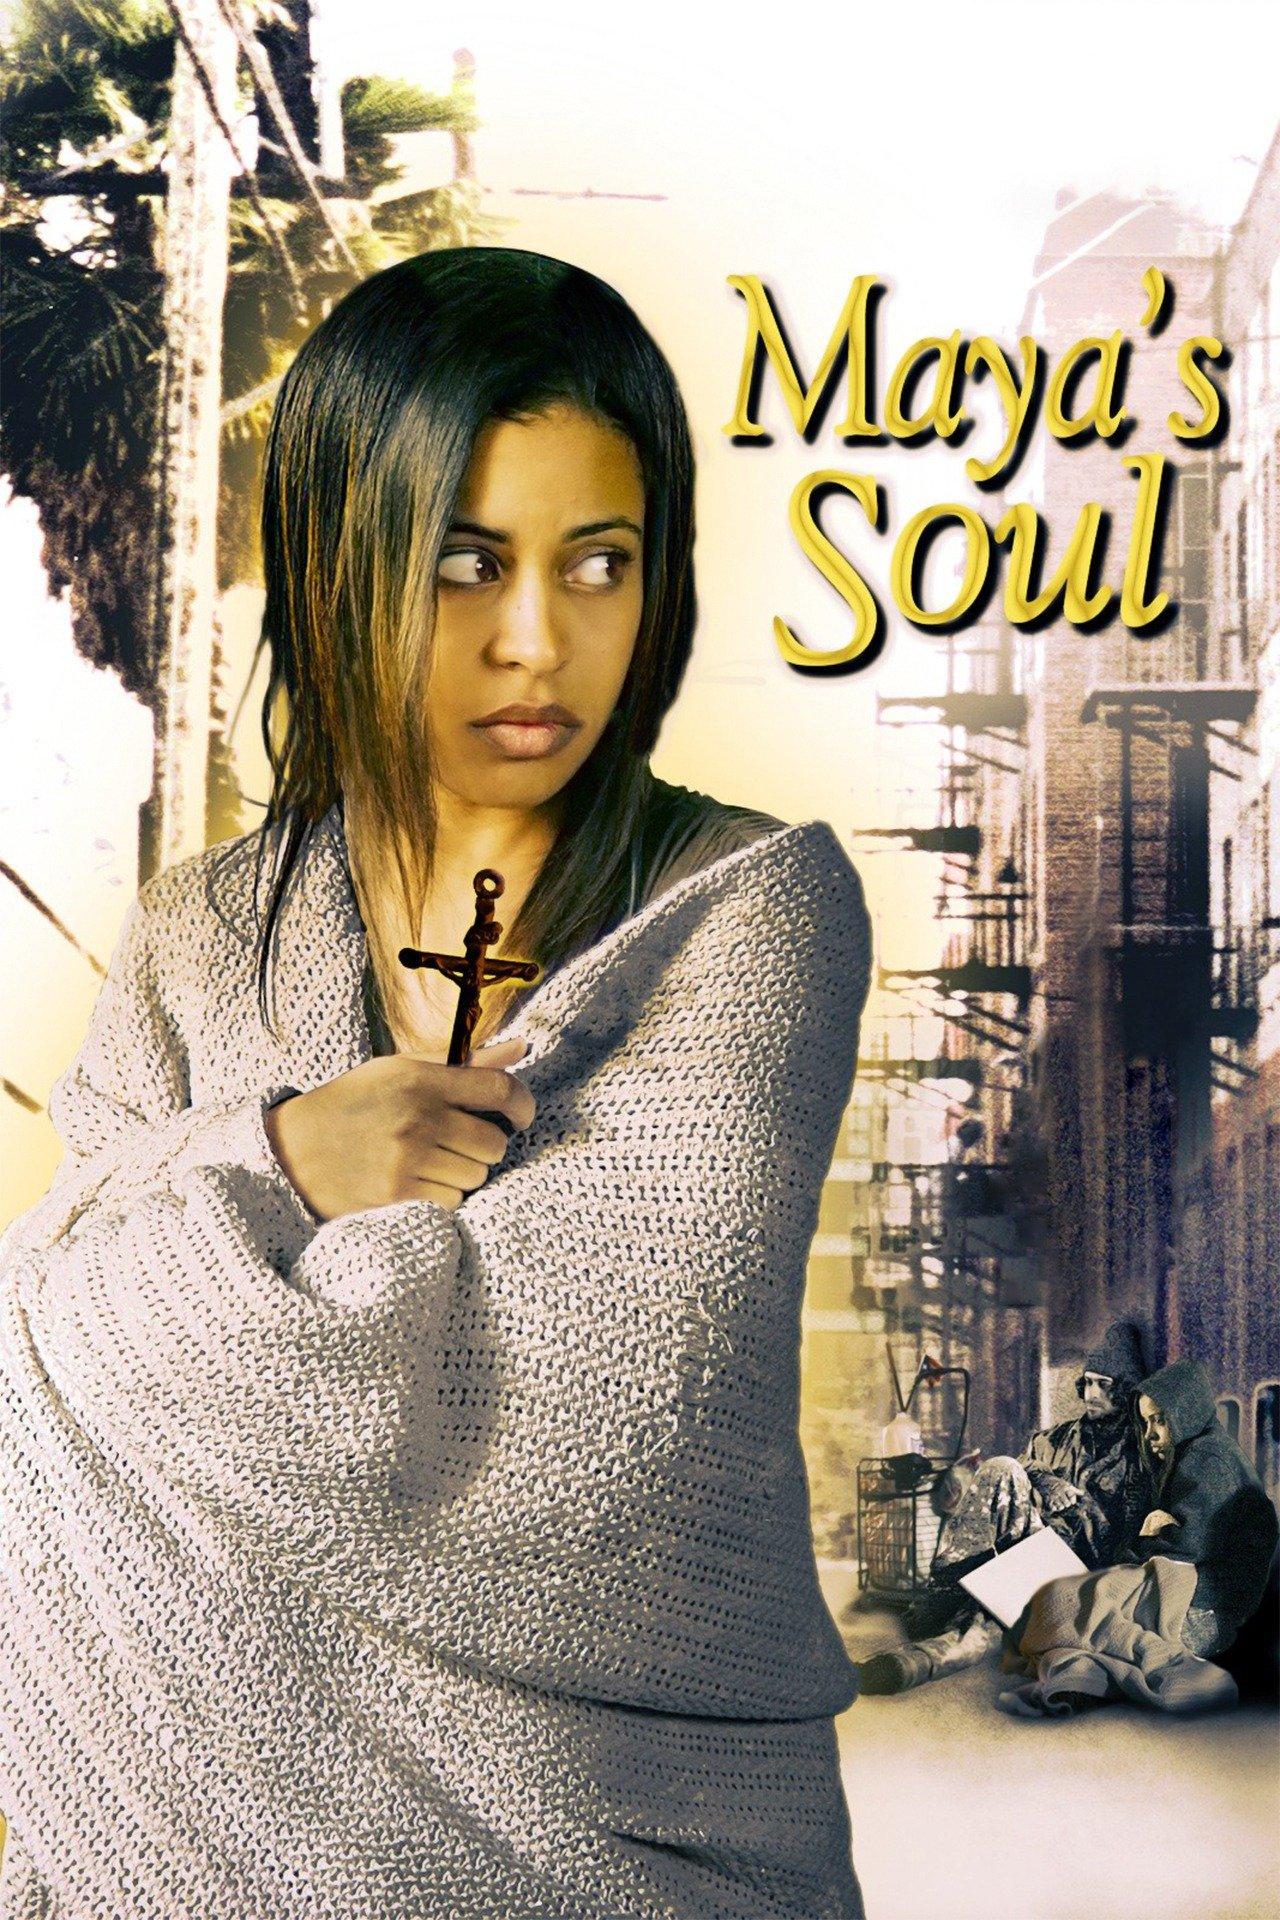 Maya's Soul on FREECABLE TV